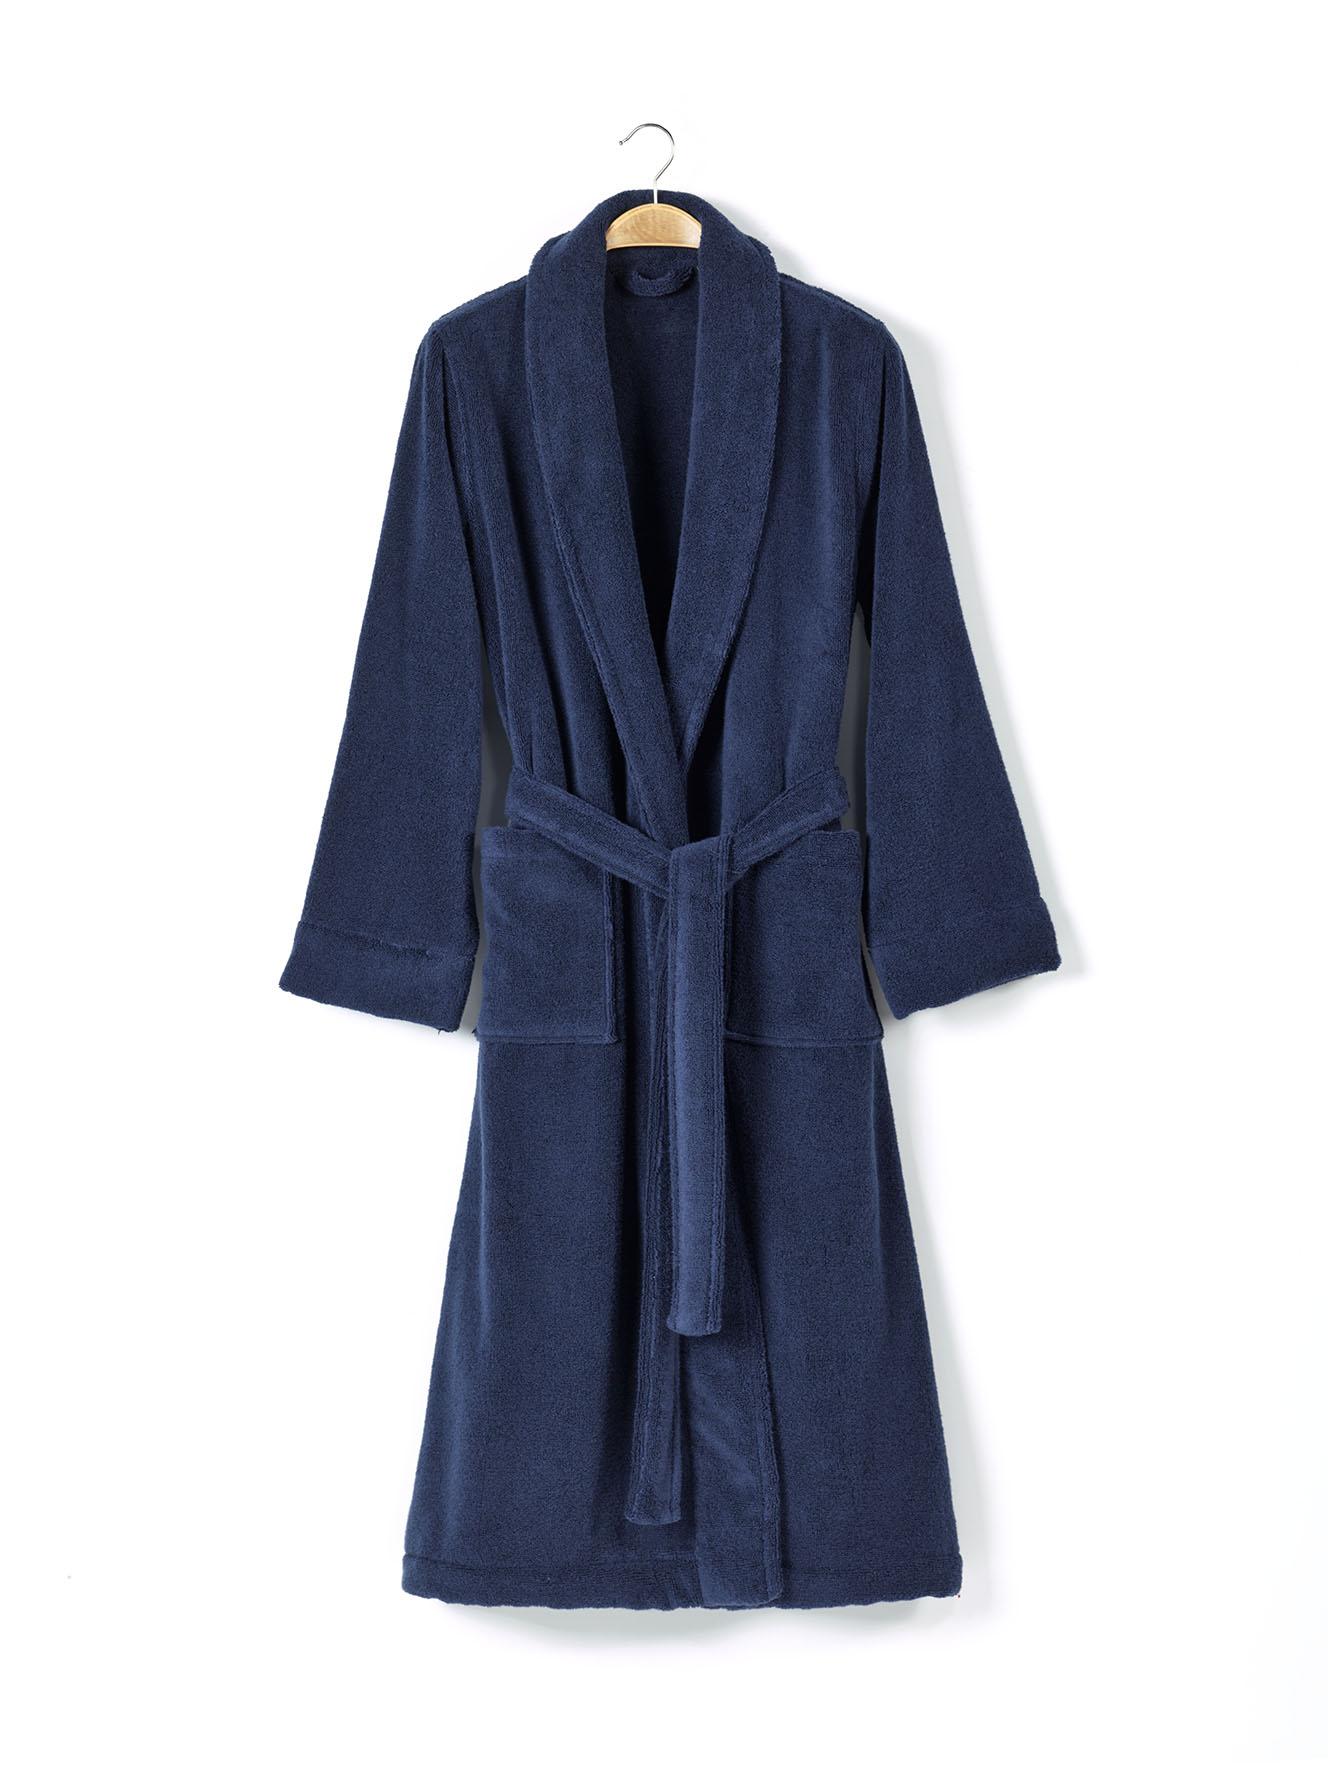 Банный халат Chicago Цвет: Синий (S) CASUAL AVENUE cae365171